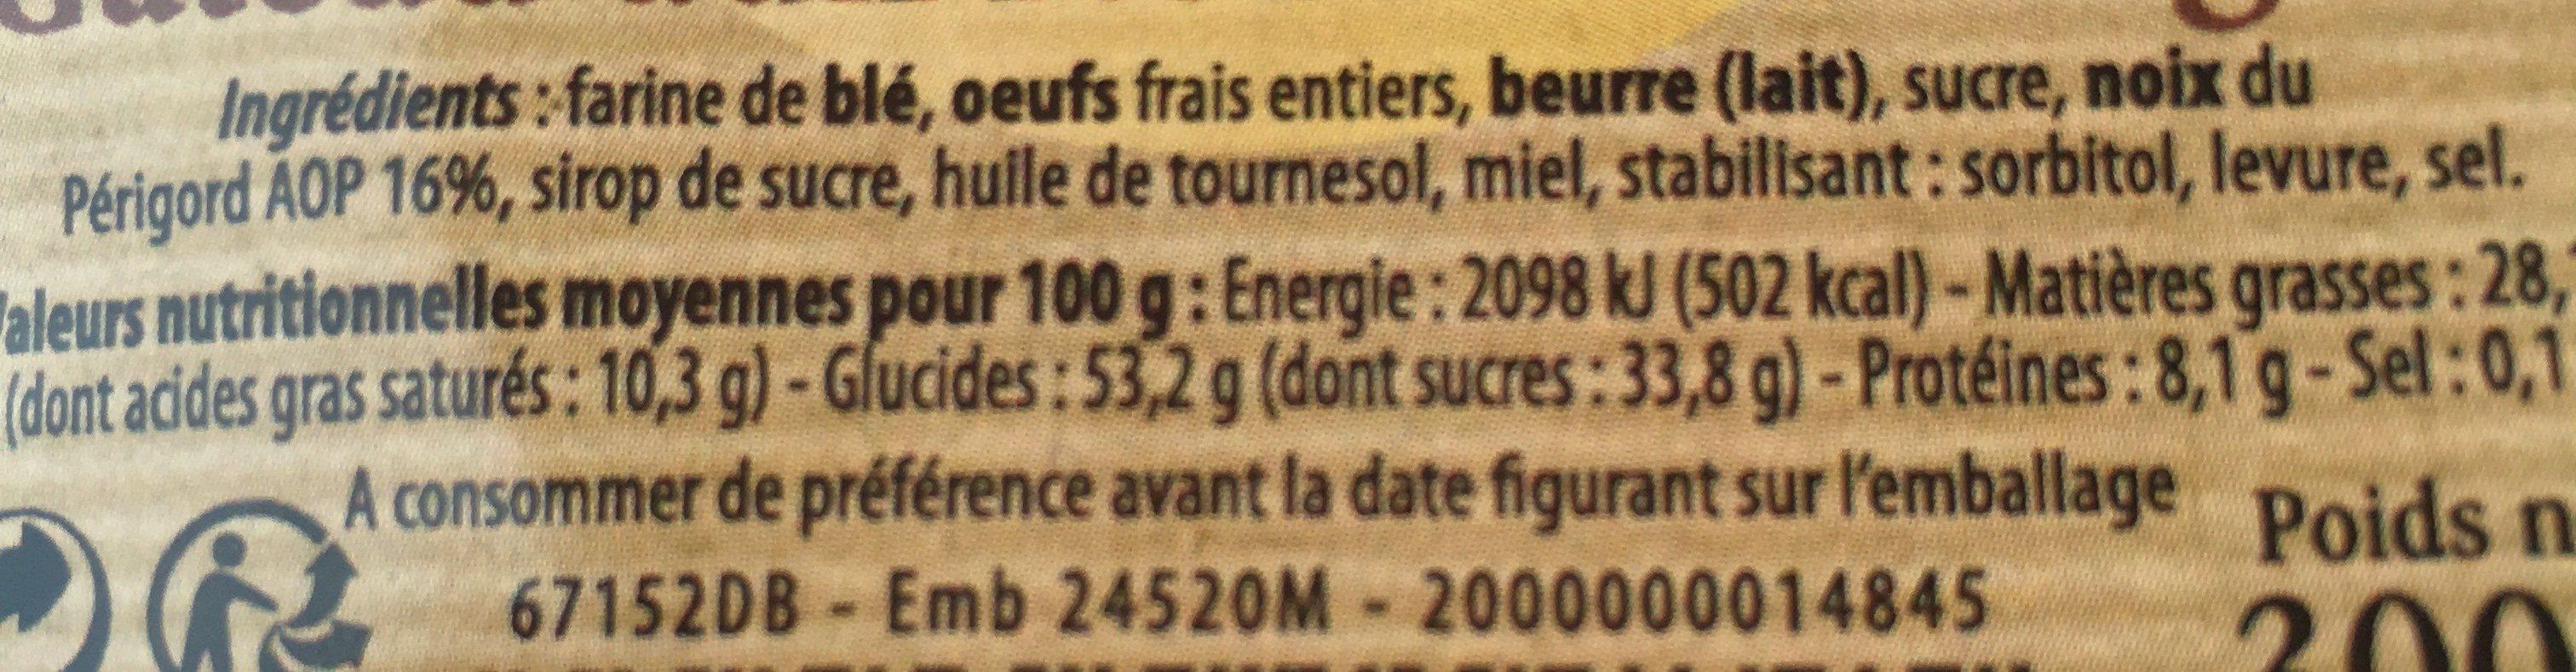 Gateau au noix du perigord - Ingredients - fr